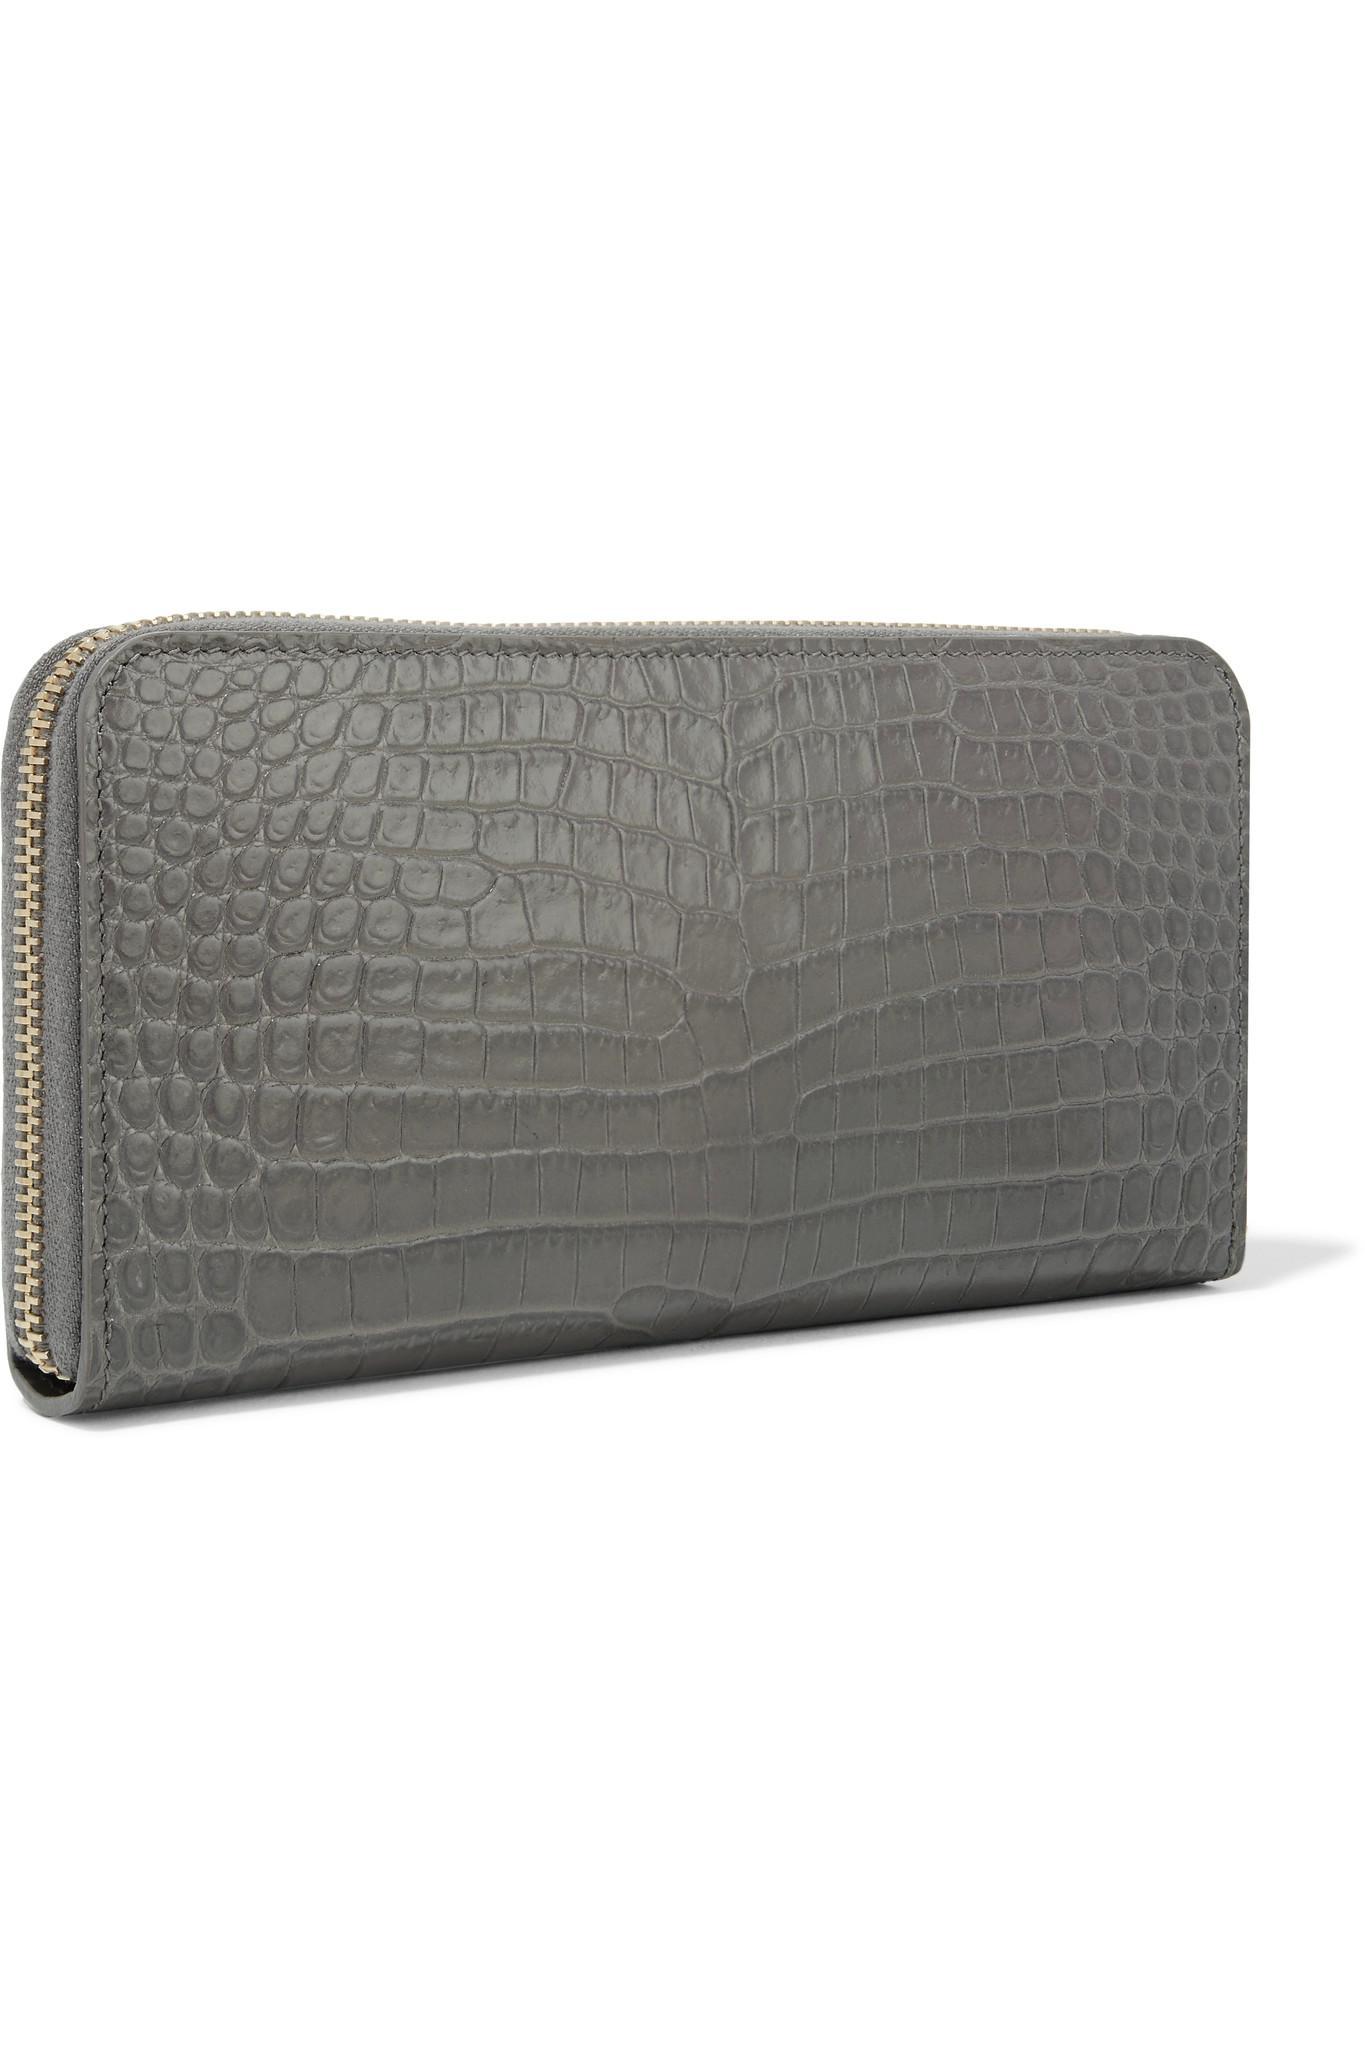 41c02449905e Lyst - Saint Laurent Croc-effect Leather Continental Wallet in Gray